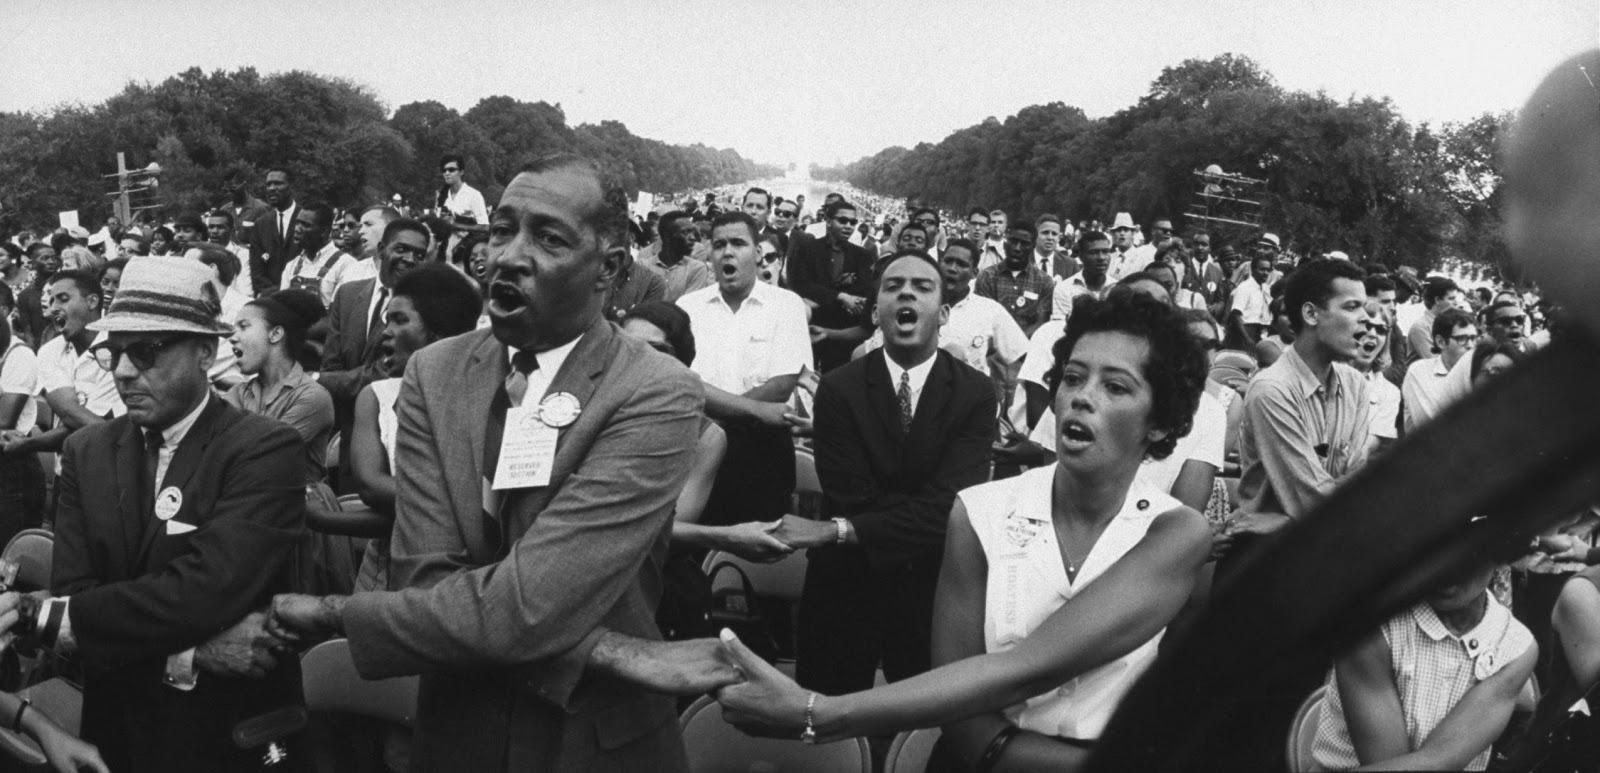 civil rights memor events - 886×625